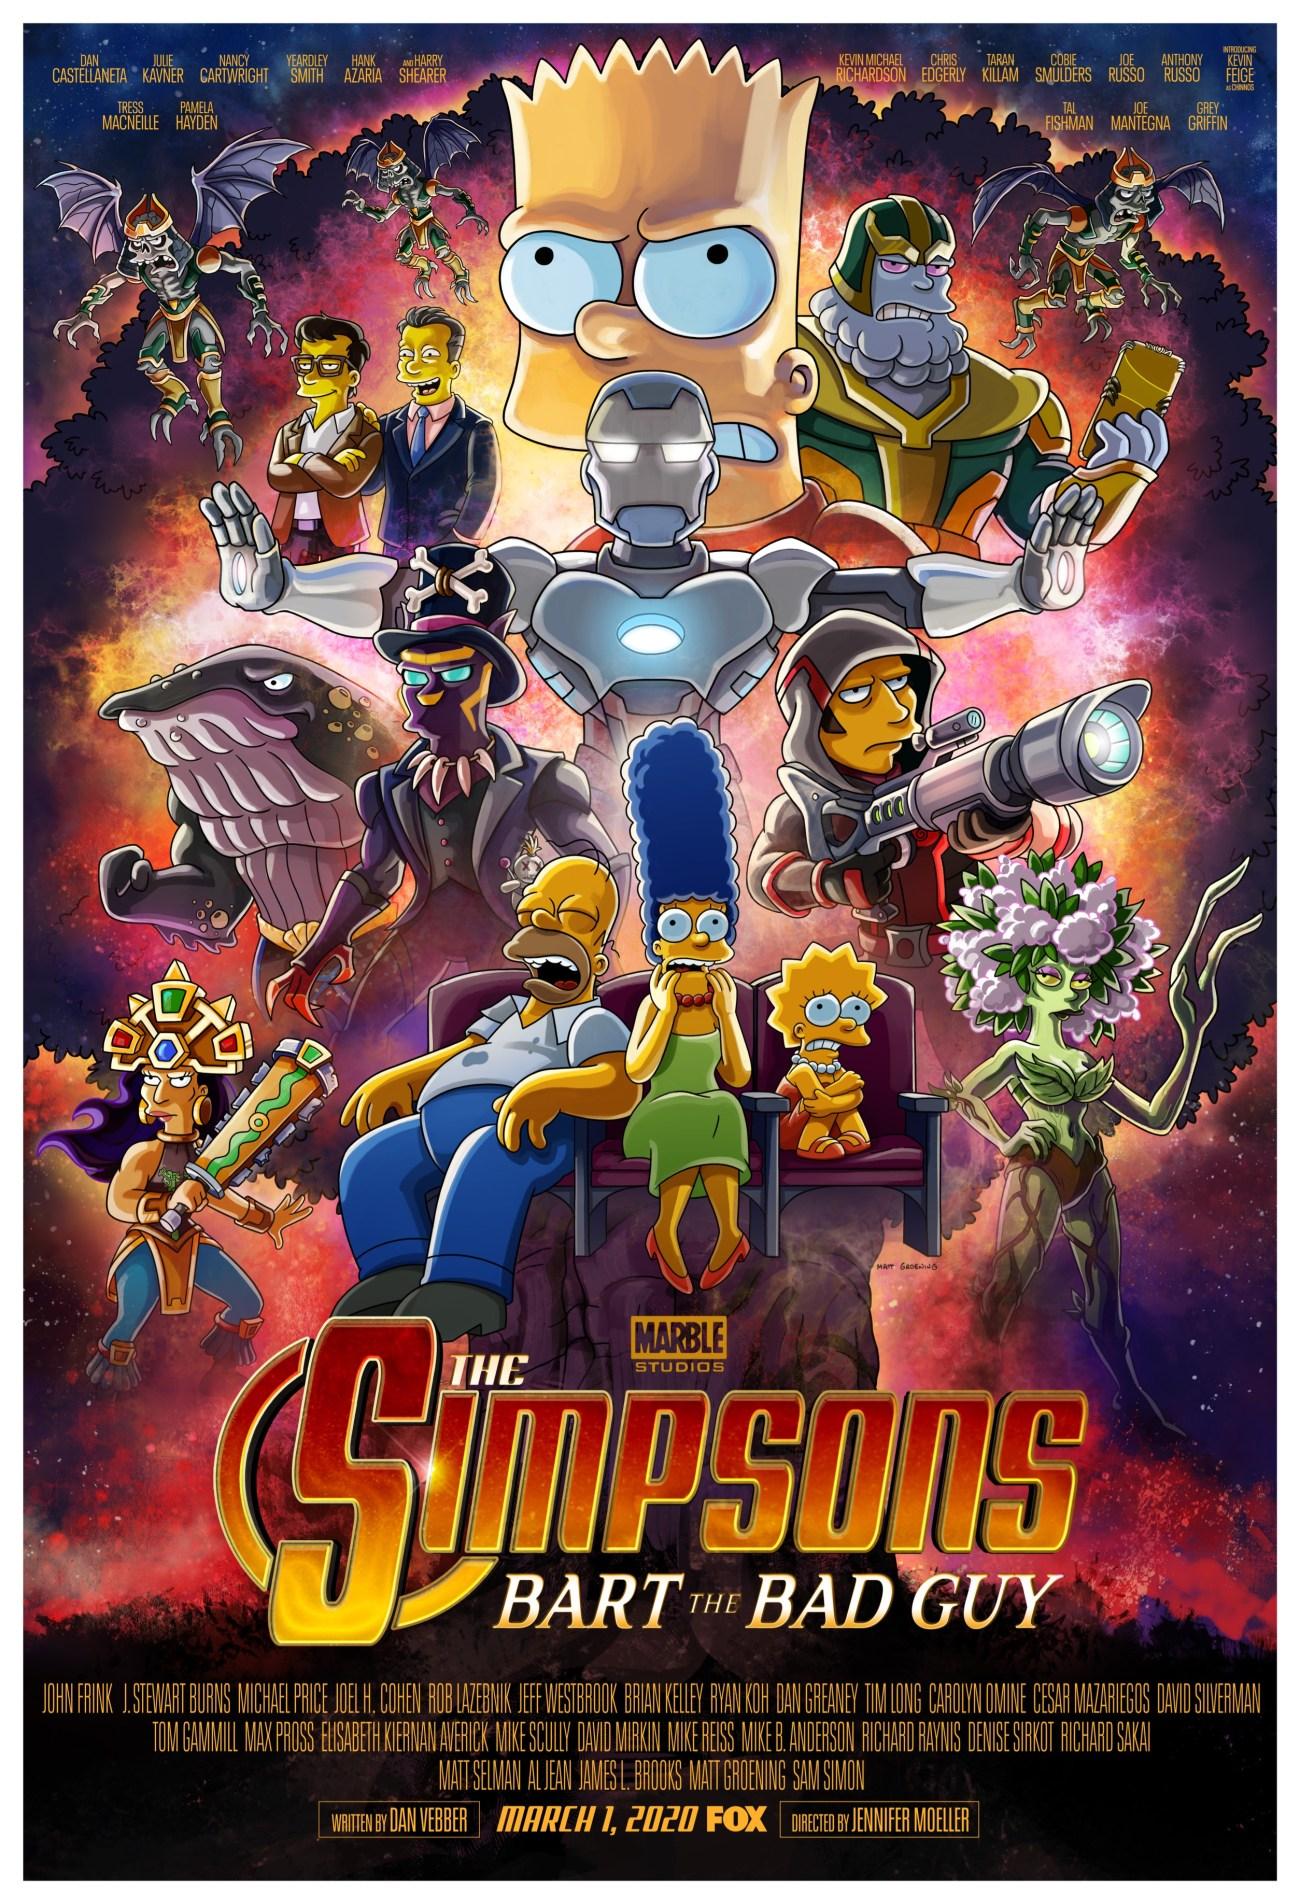 Póster del episodio Bart the Bart Guy de The Simpsons. Imagen: The Simpsons Twitter (@TheSimpsons).